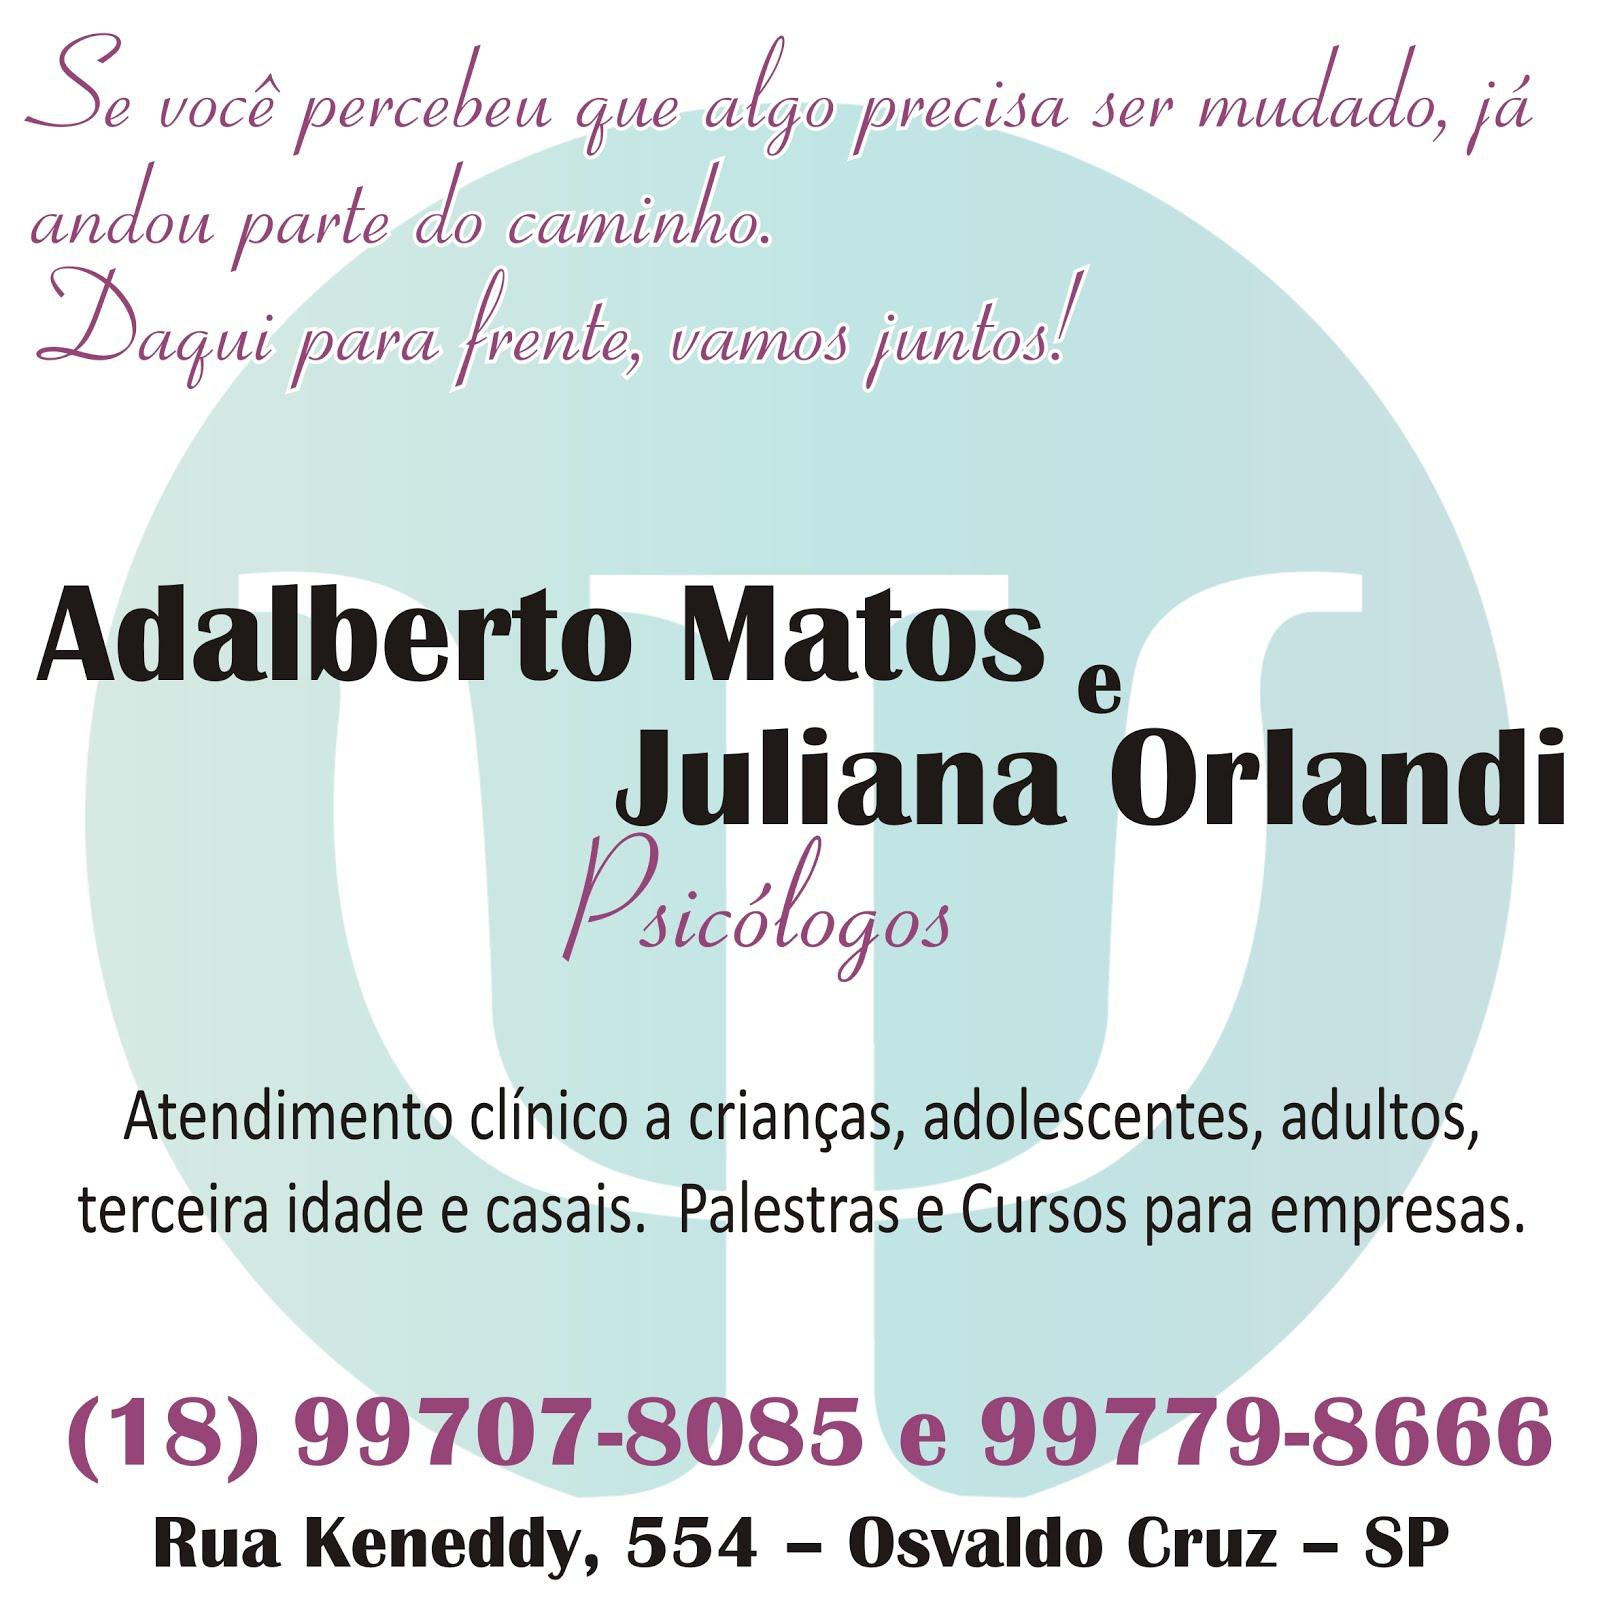 Adalberto Matos